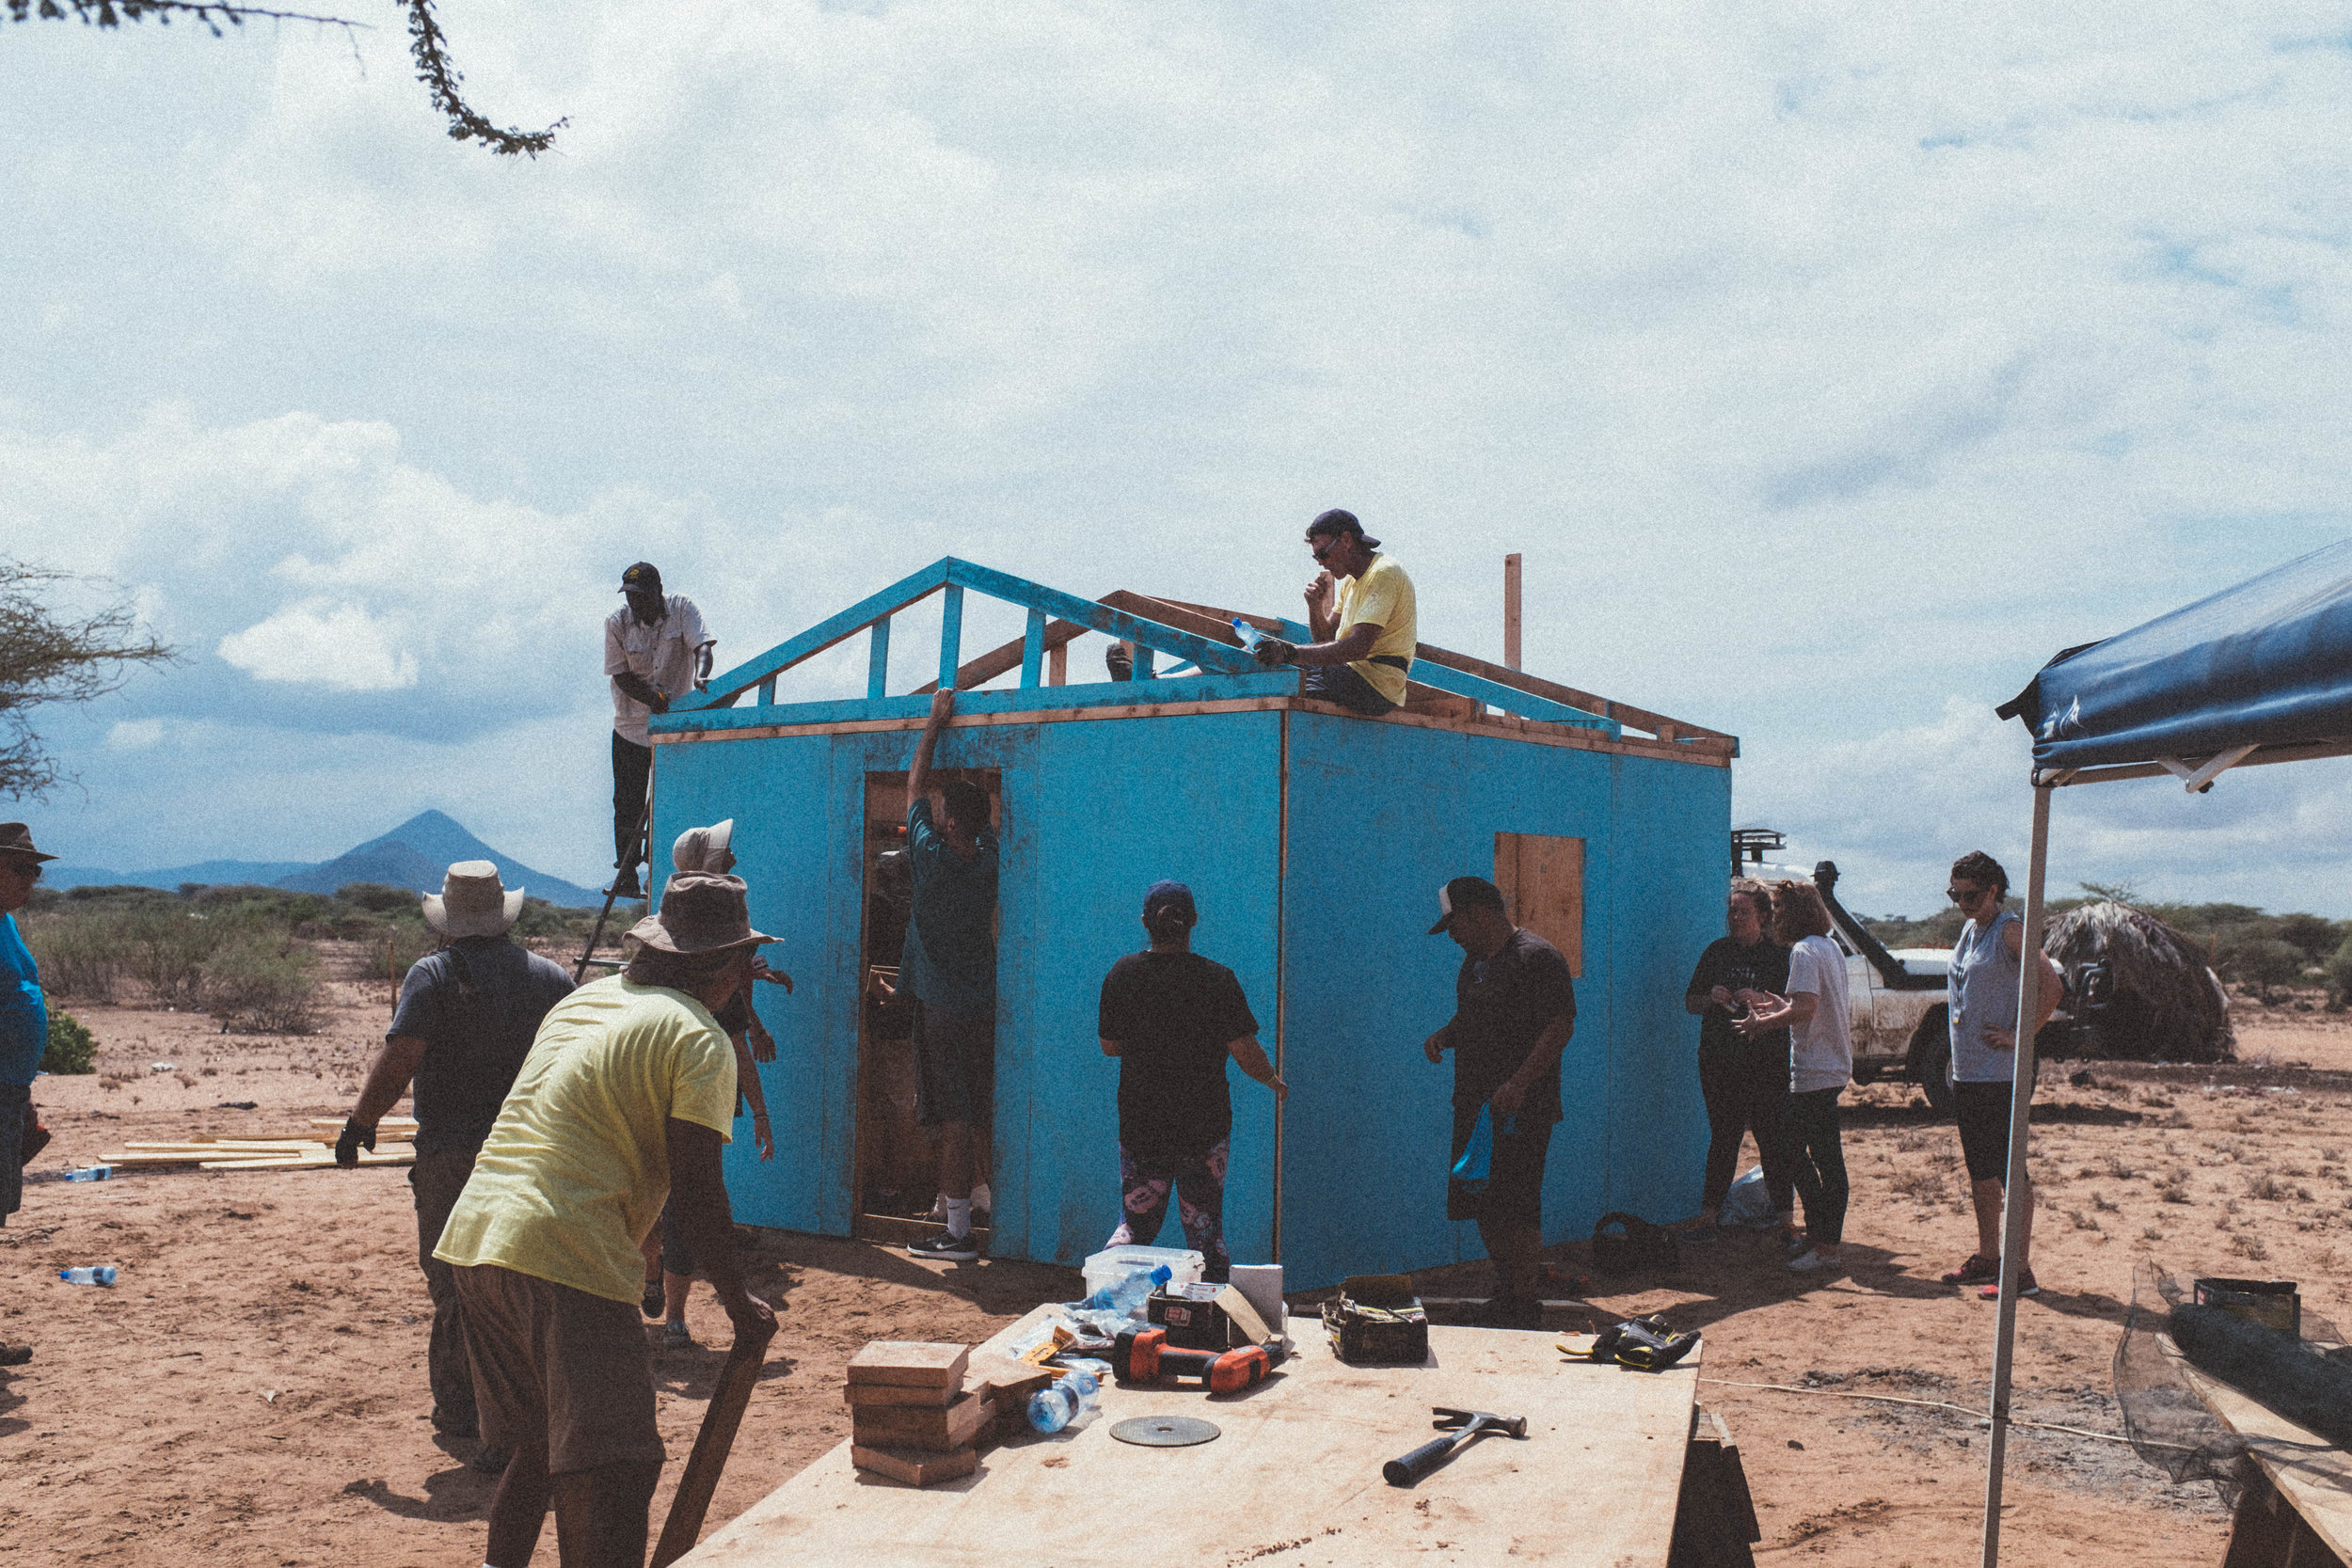 Homes for marginalized families in Kenya